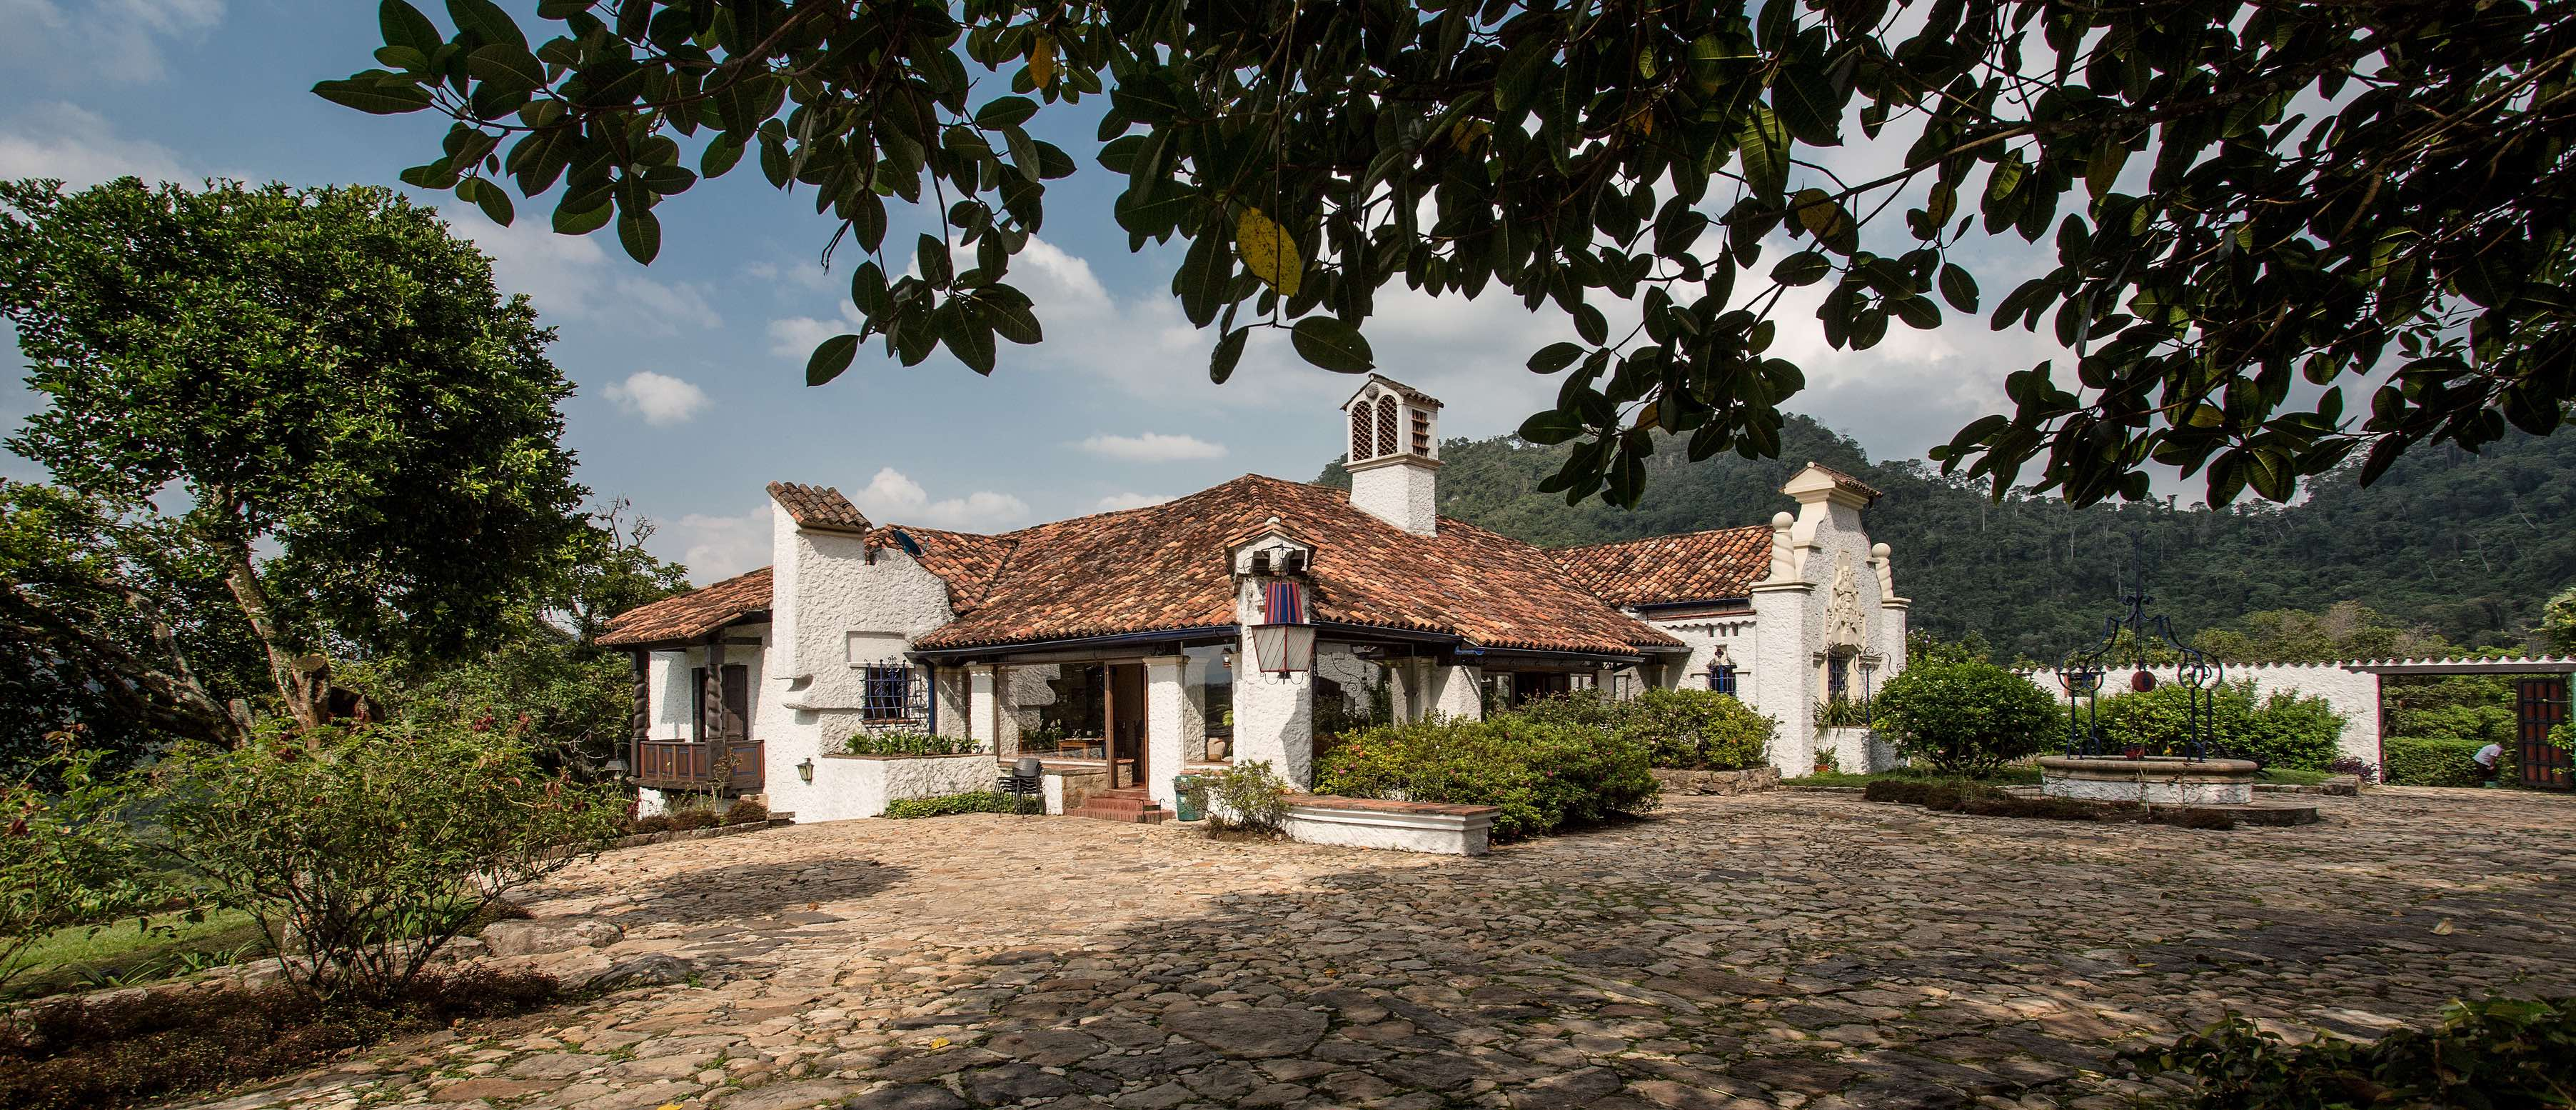 Finca-El-Refugio-Hotel-Spa-Sasaima-Maison